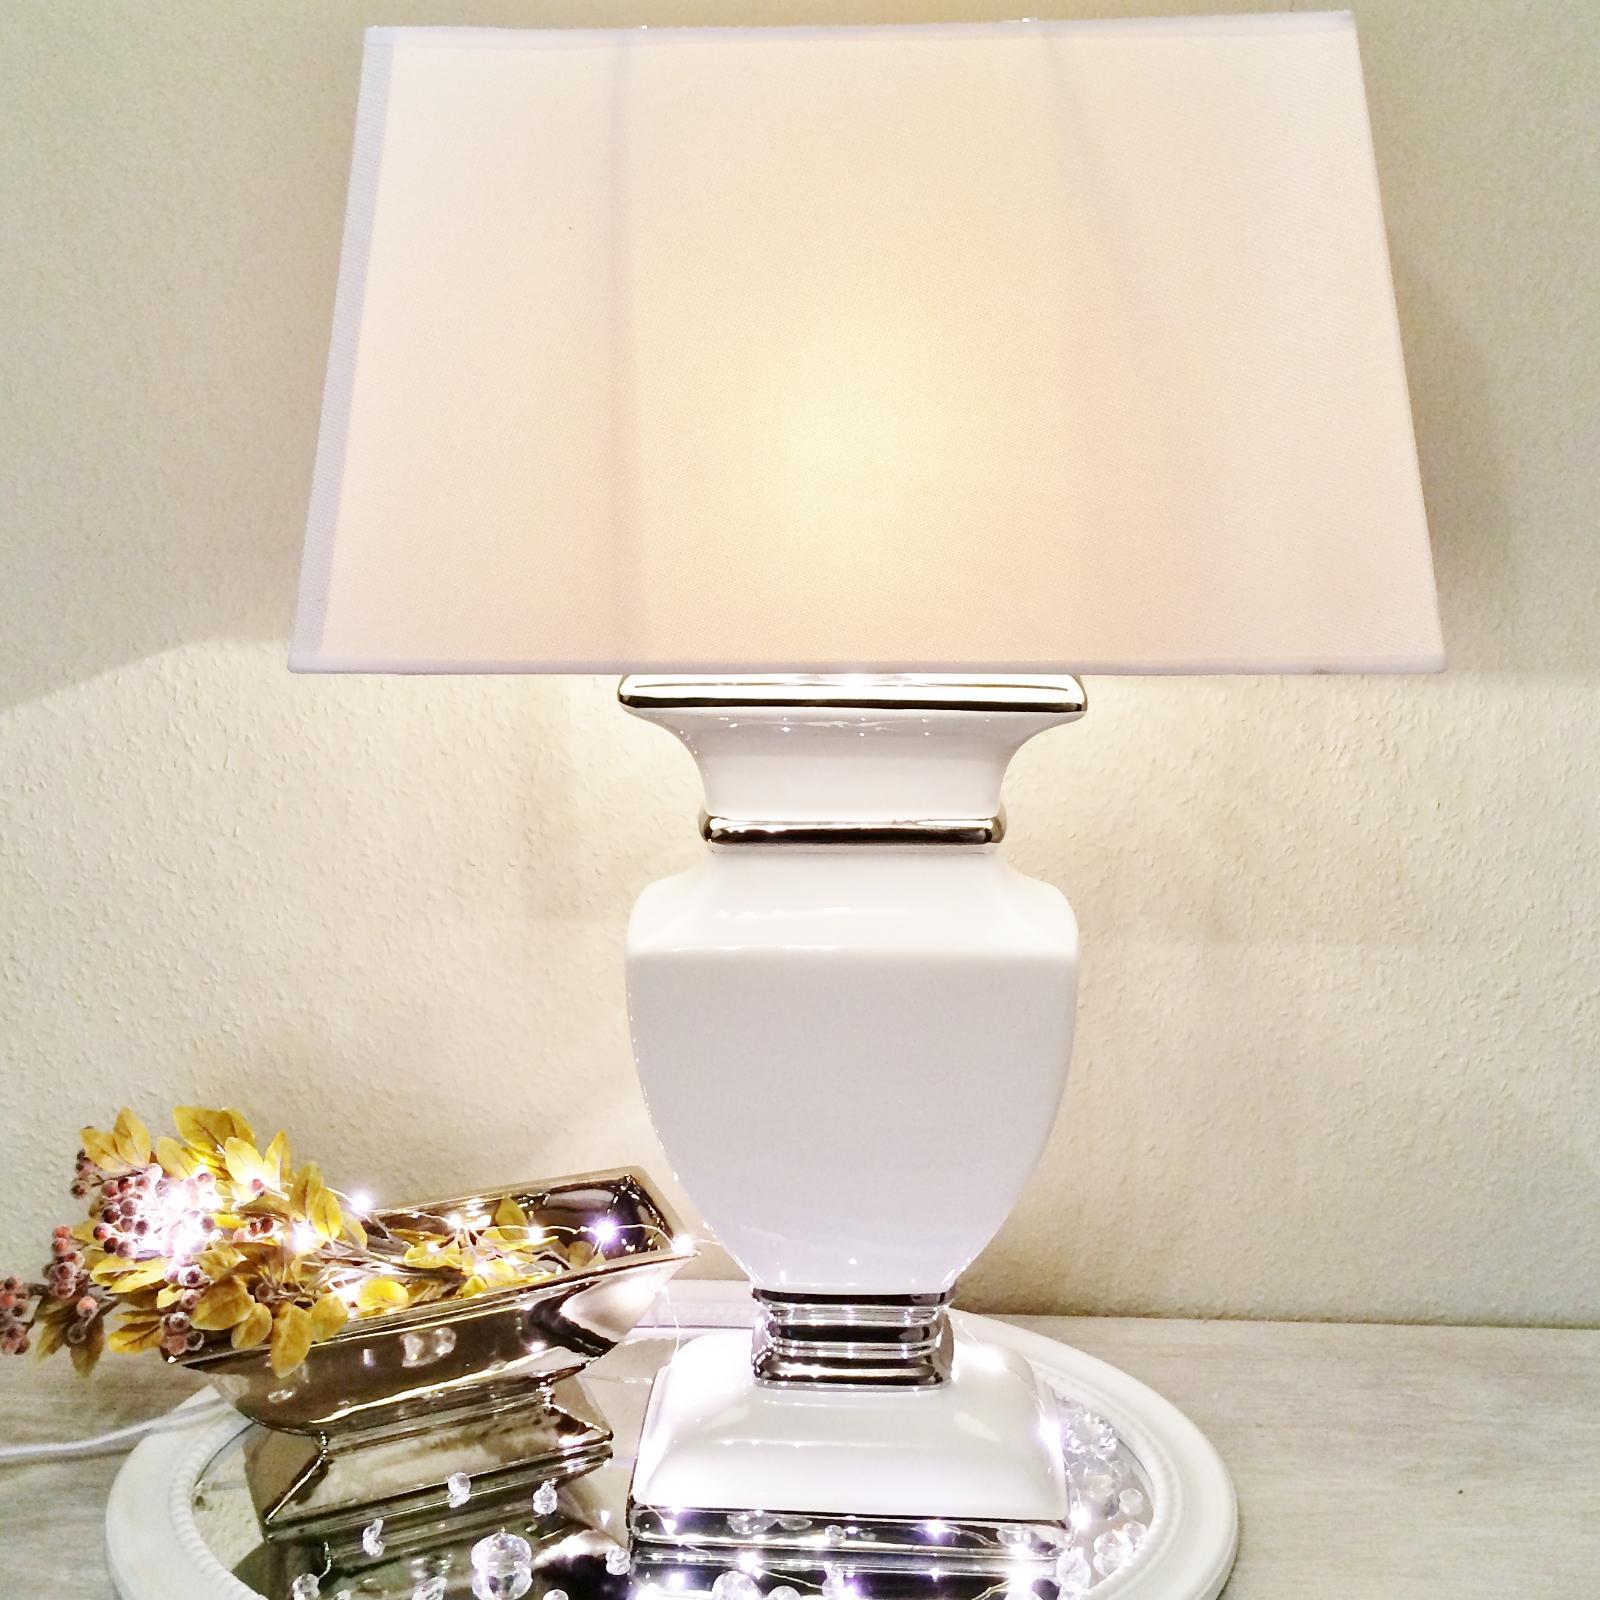 white lady keramik lampe 43cm lampenfu lampenschirm wei nachttischlampe shabby ebay. Black Bedroom Furniture Sets. Home Design Ideas